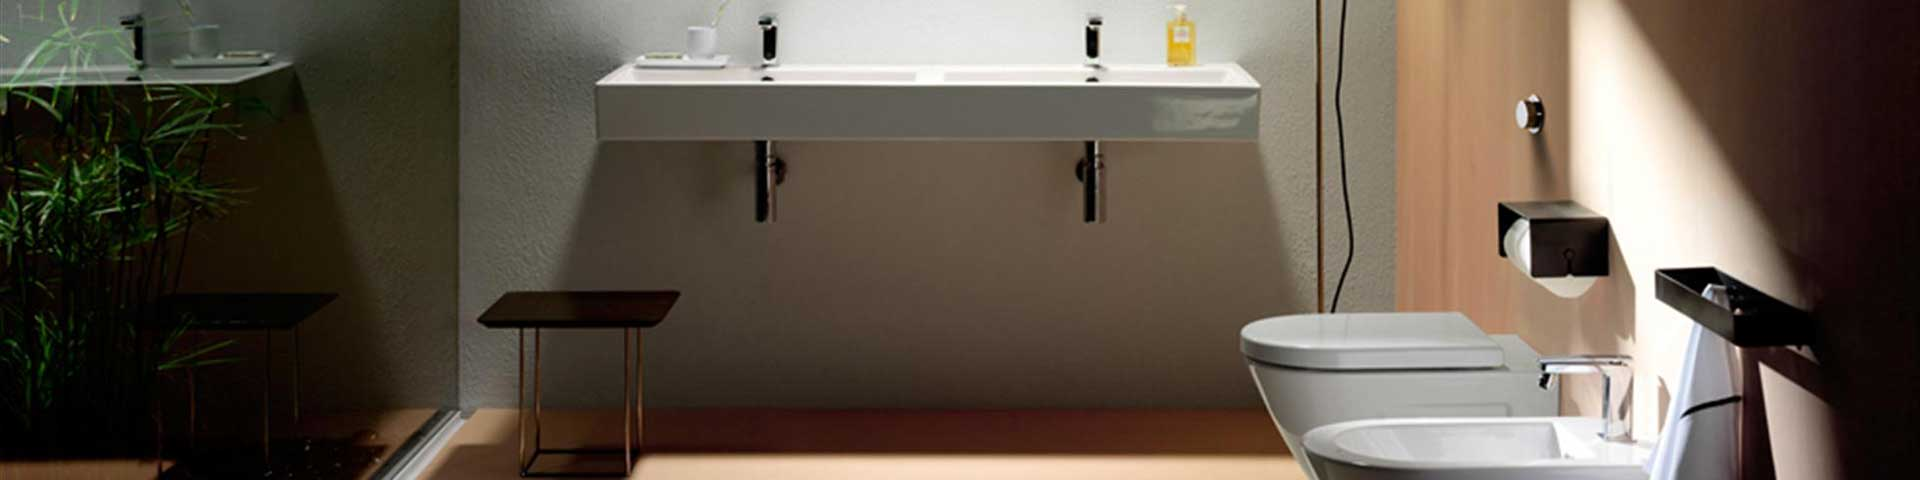 sanitari lavabi vasi wc bidet e piatti doccia roma